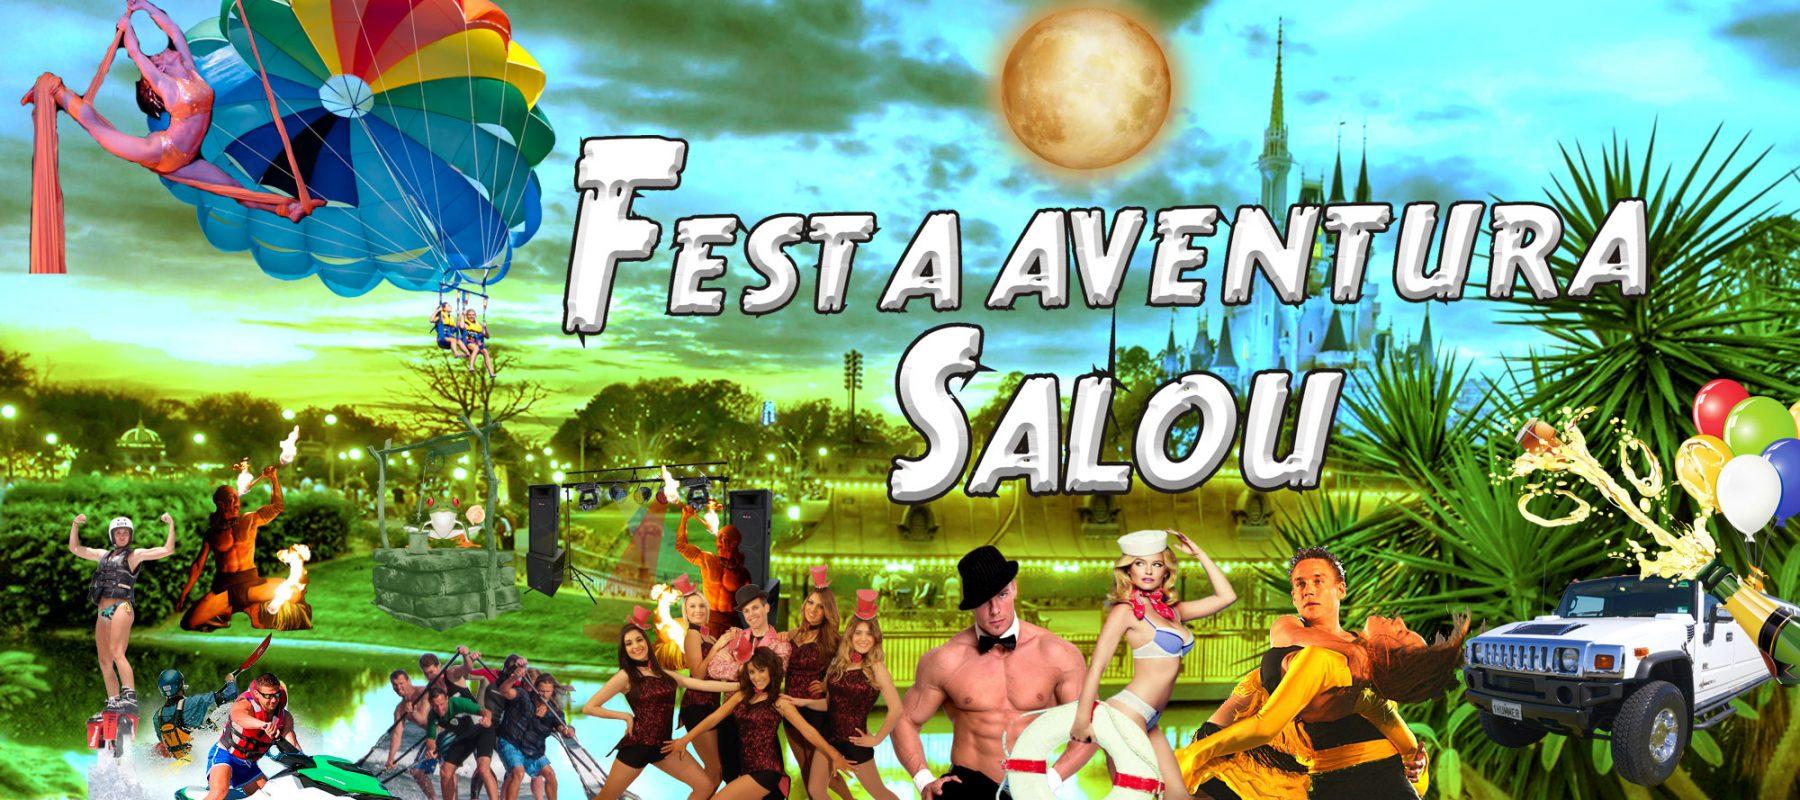 Festa Aventura Salou